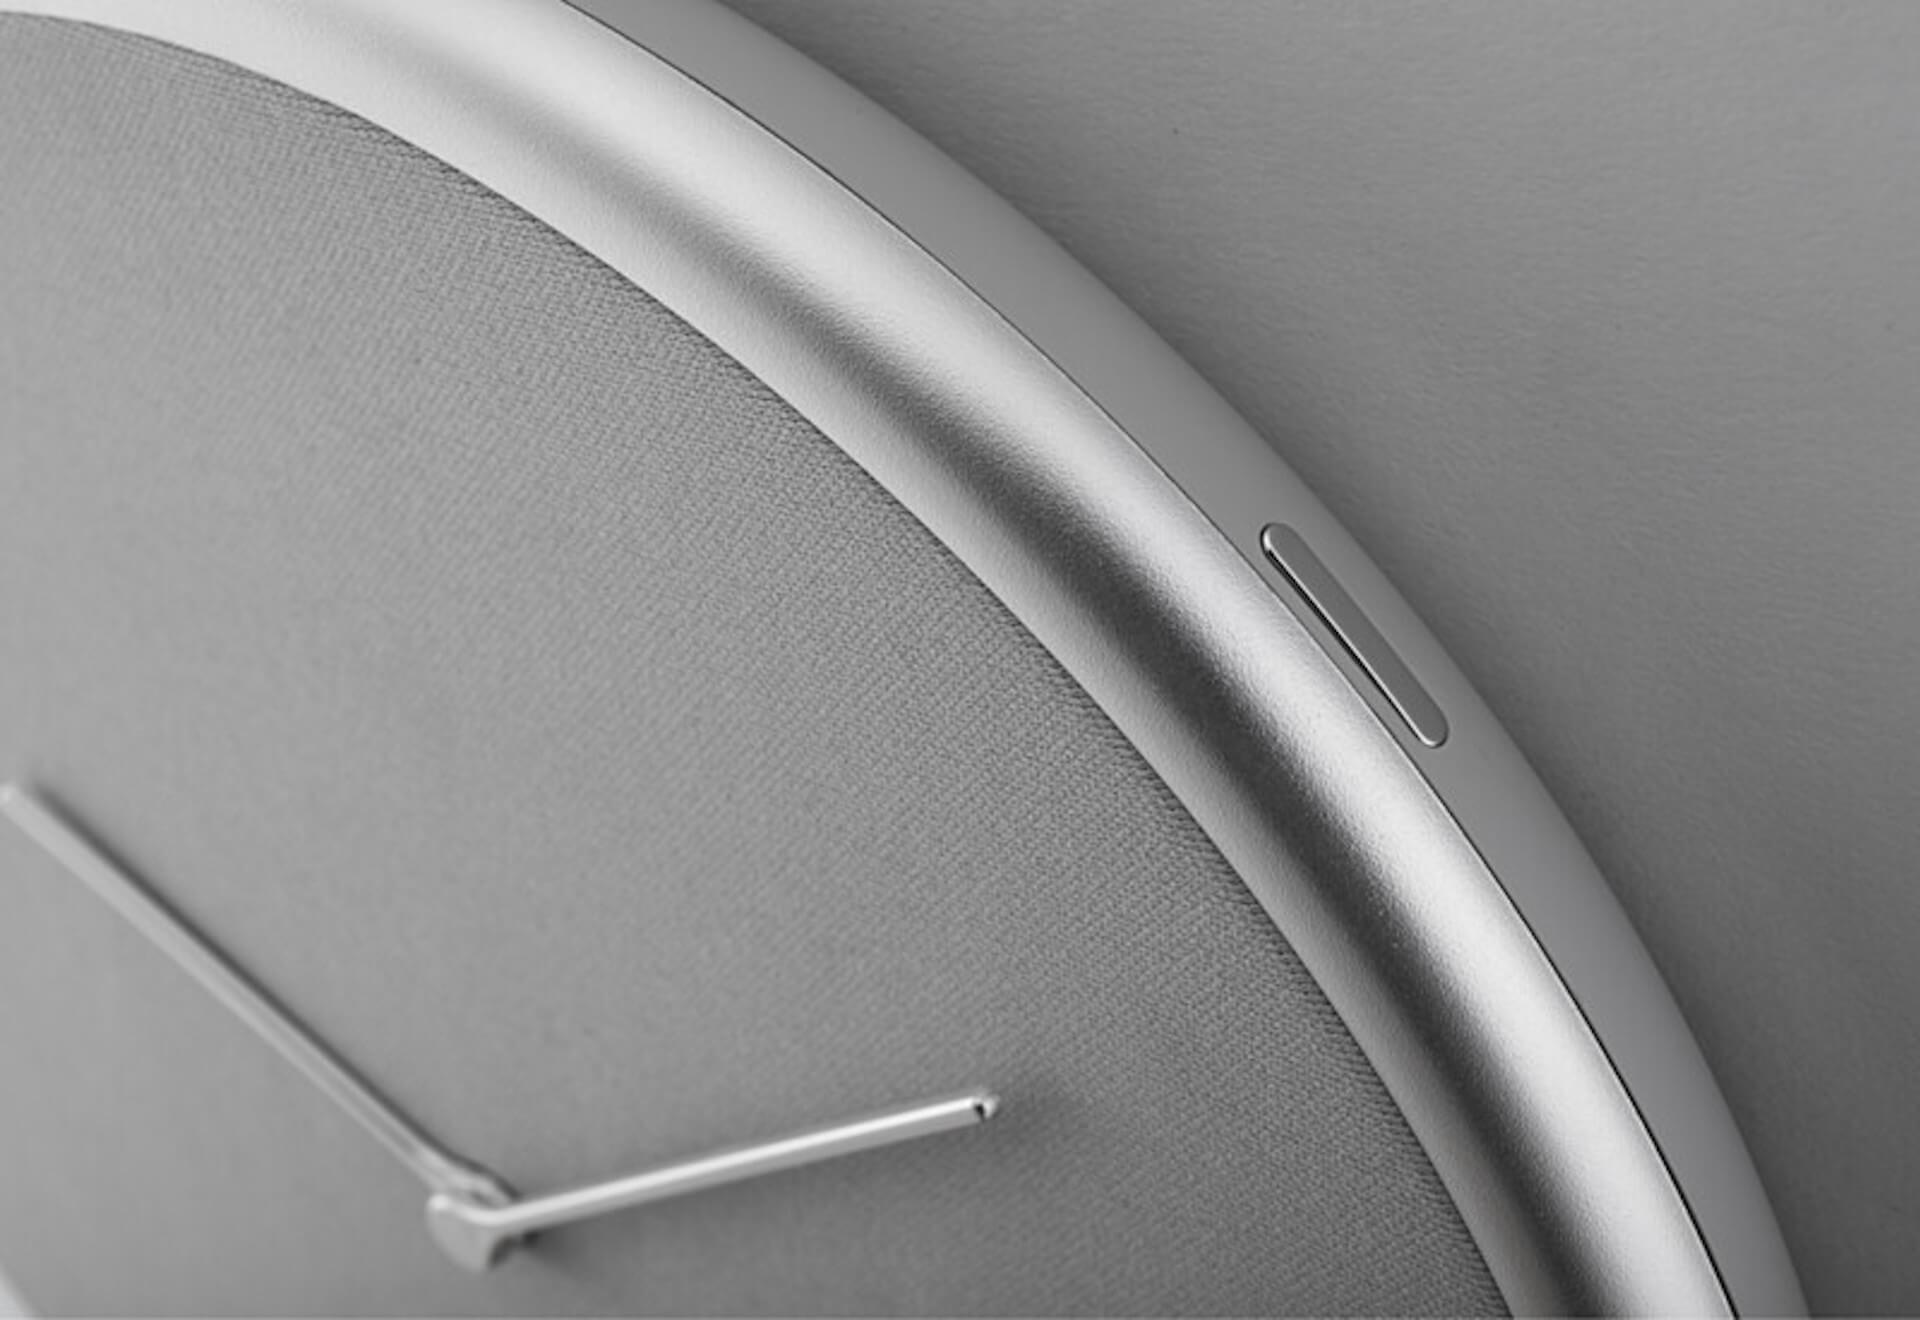 Google・Apple同期でスケジュール管理|忙しい日常をサポートするIoT掛け時計「Glance Clock」が登場 tech190904glanceclock_4